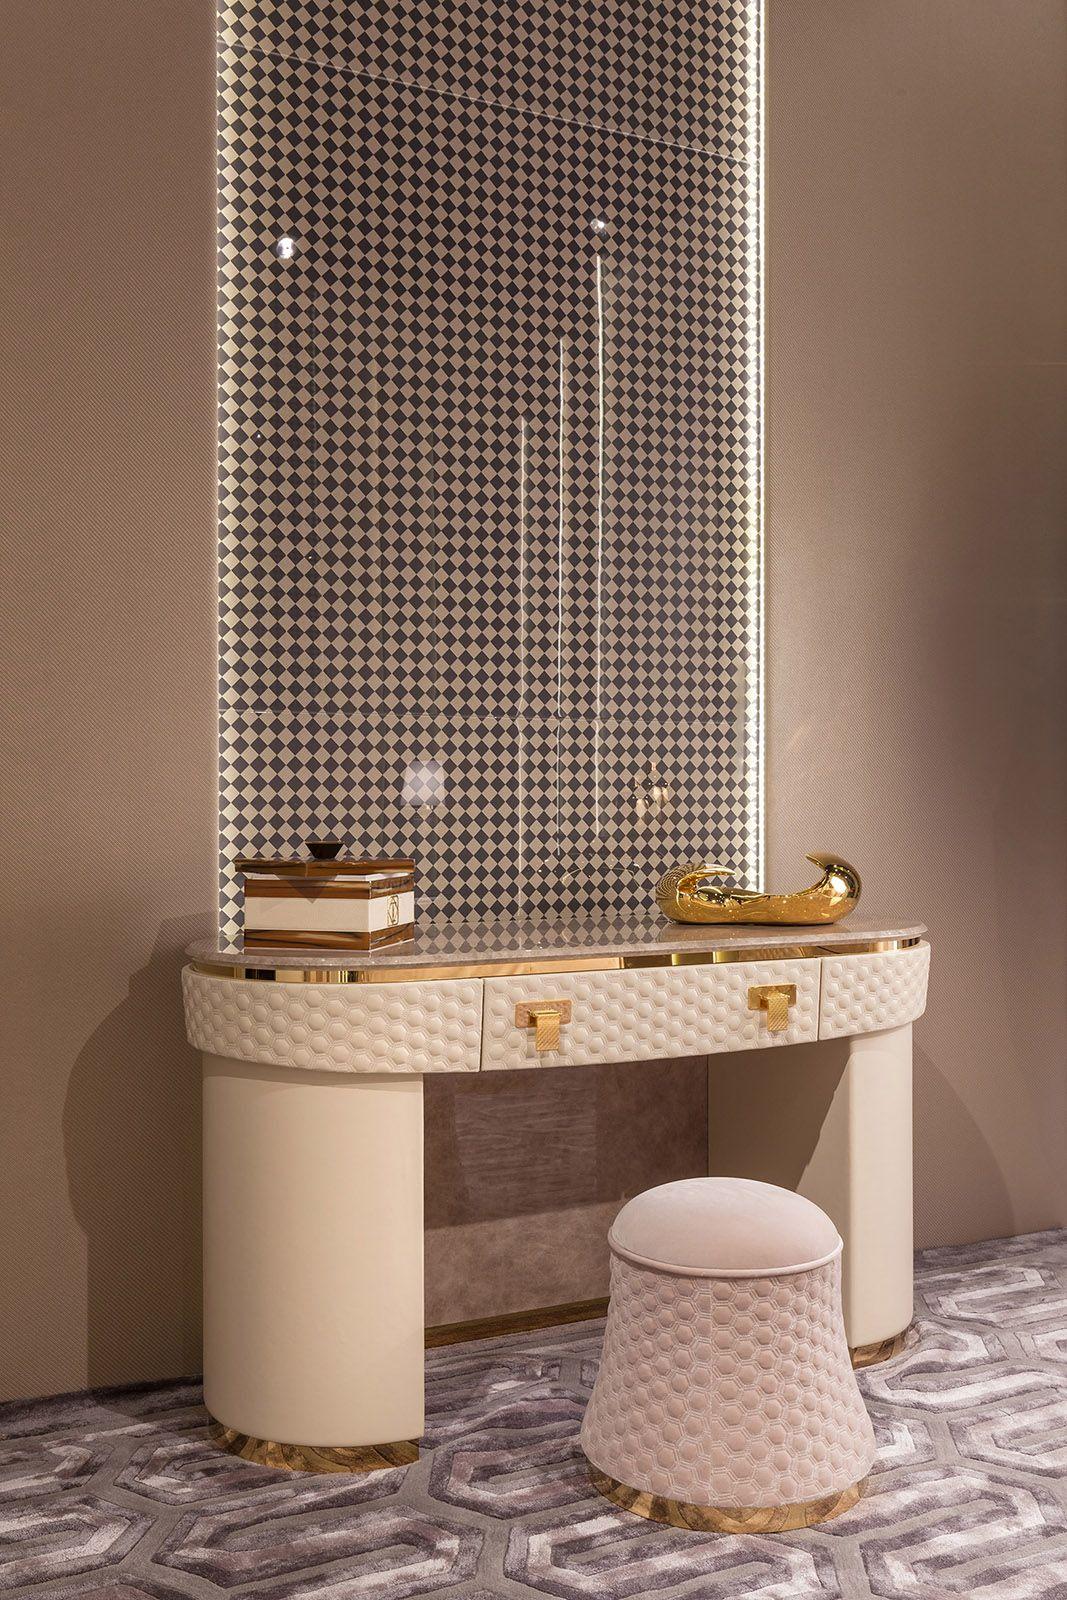 Turri luxury italian furniture for exclusive and modern design the art of sleeping - Mobili luxury design ...